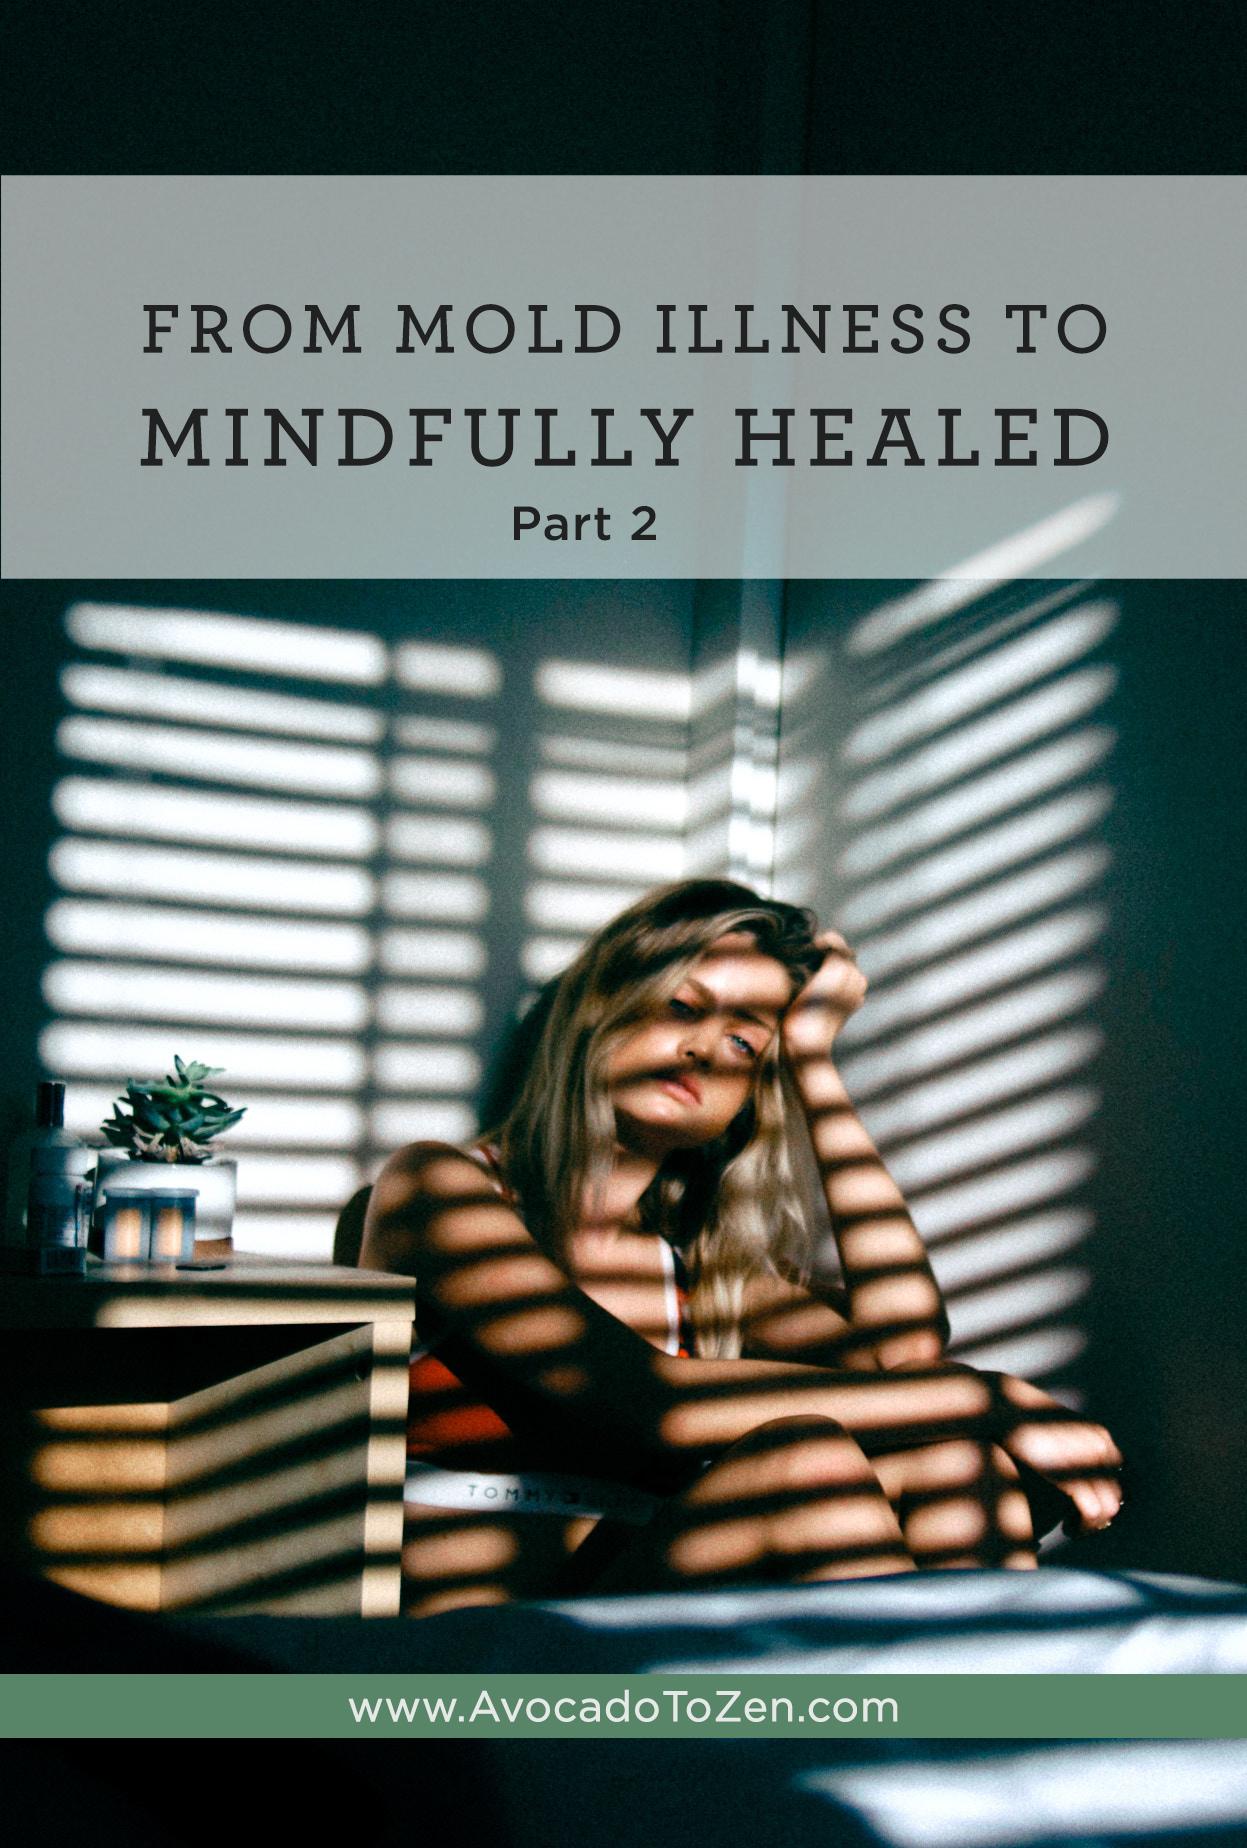 mold illness to mindfully healed